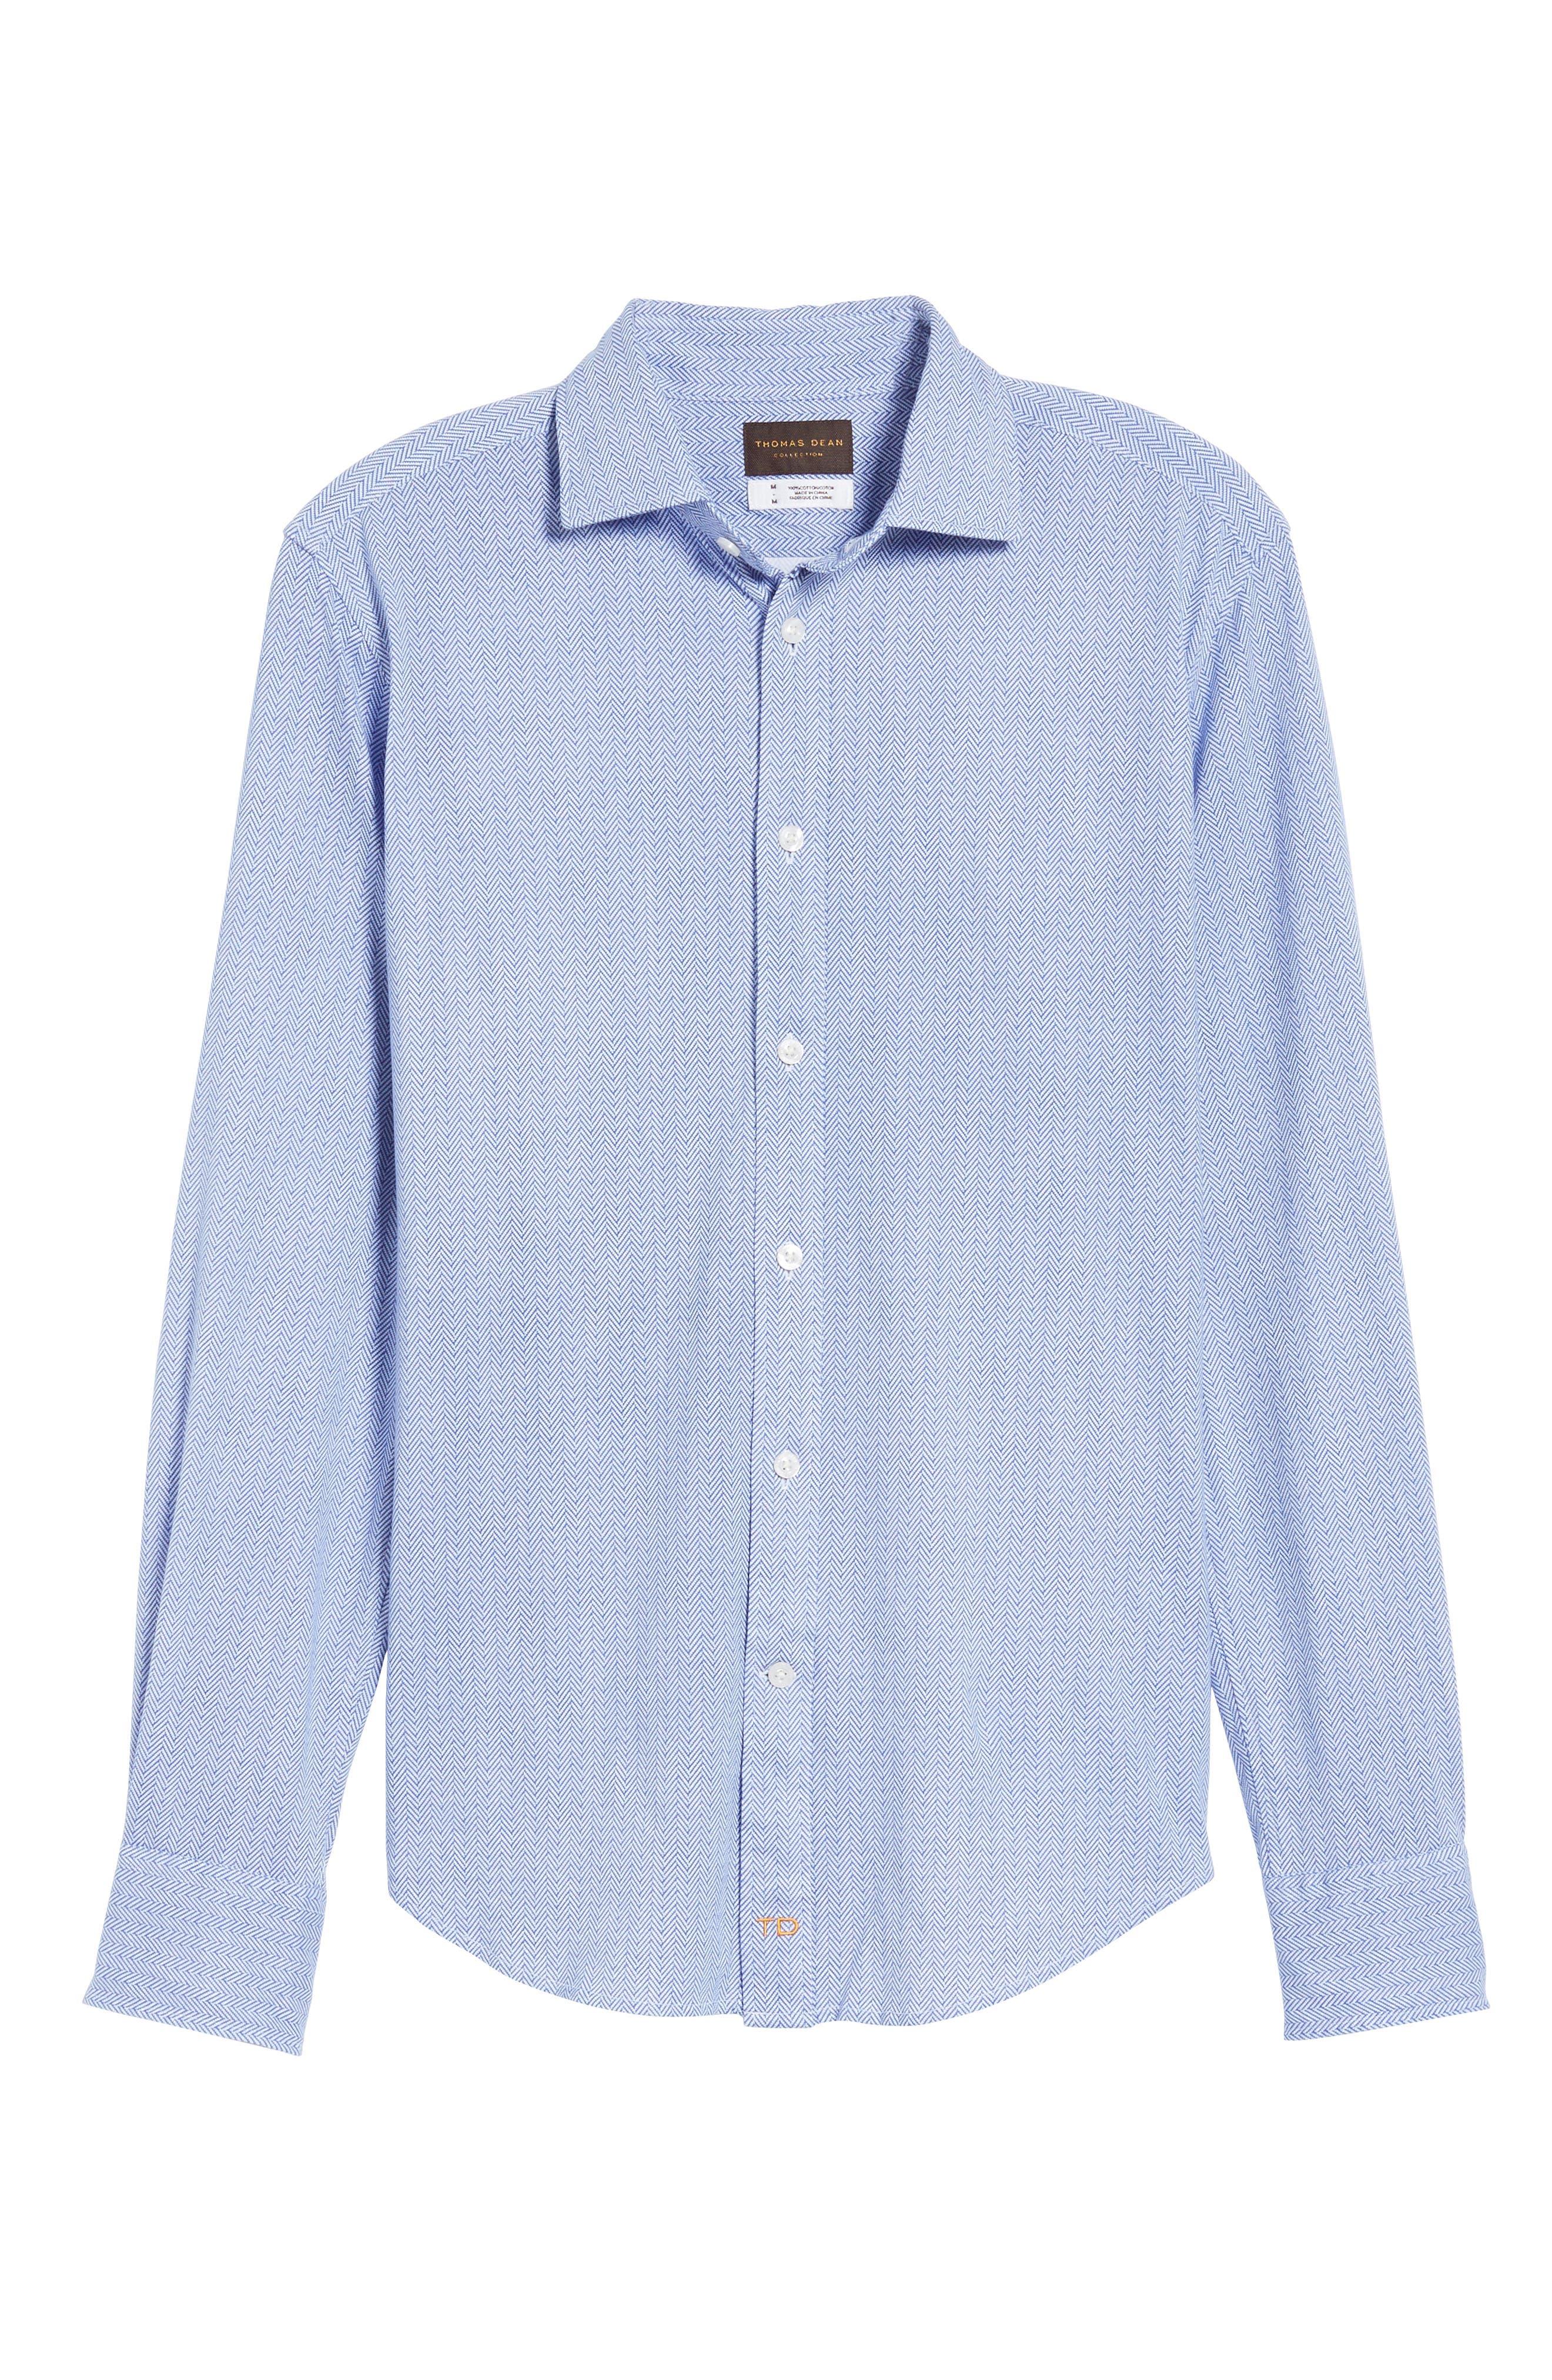 Herringbone Knit Sport Shirt,                             Alternate thumbnail 6, color,                             400